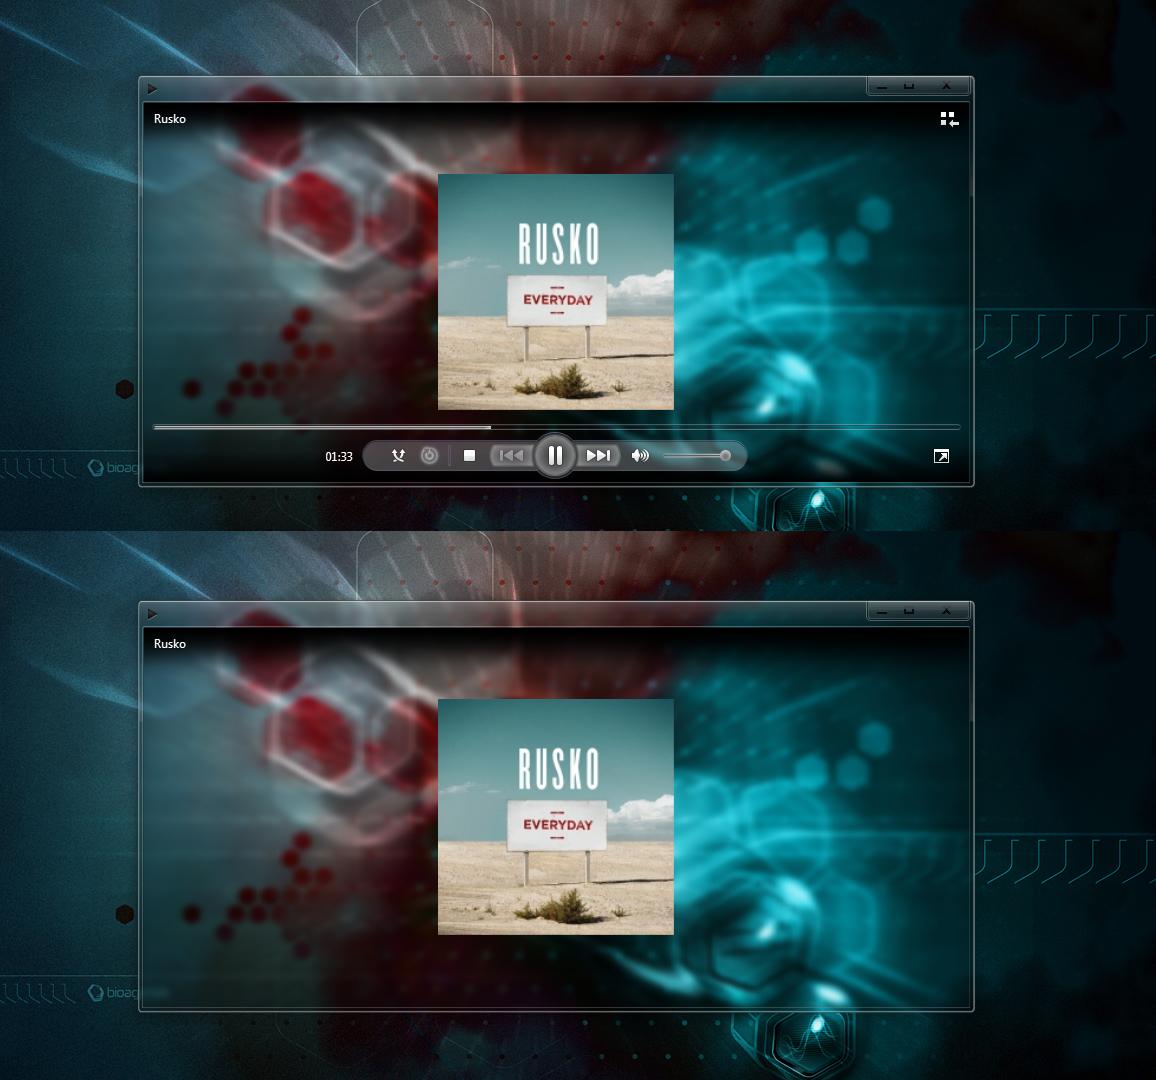 Skins for windows media player 12